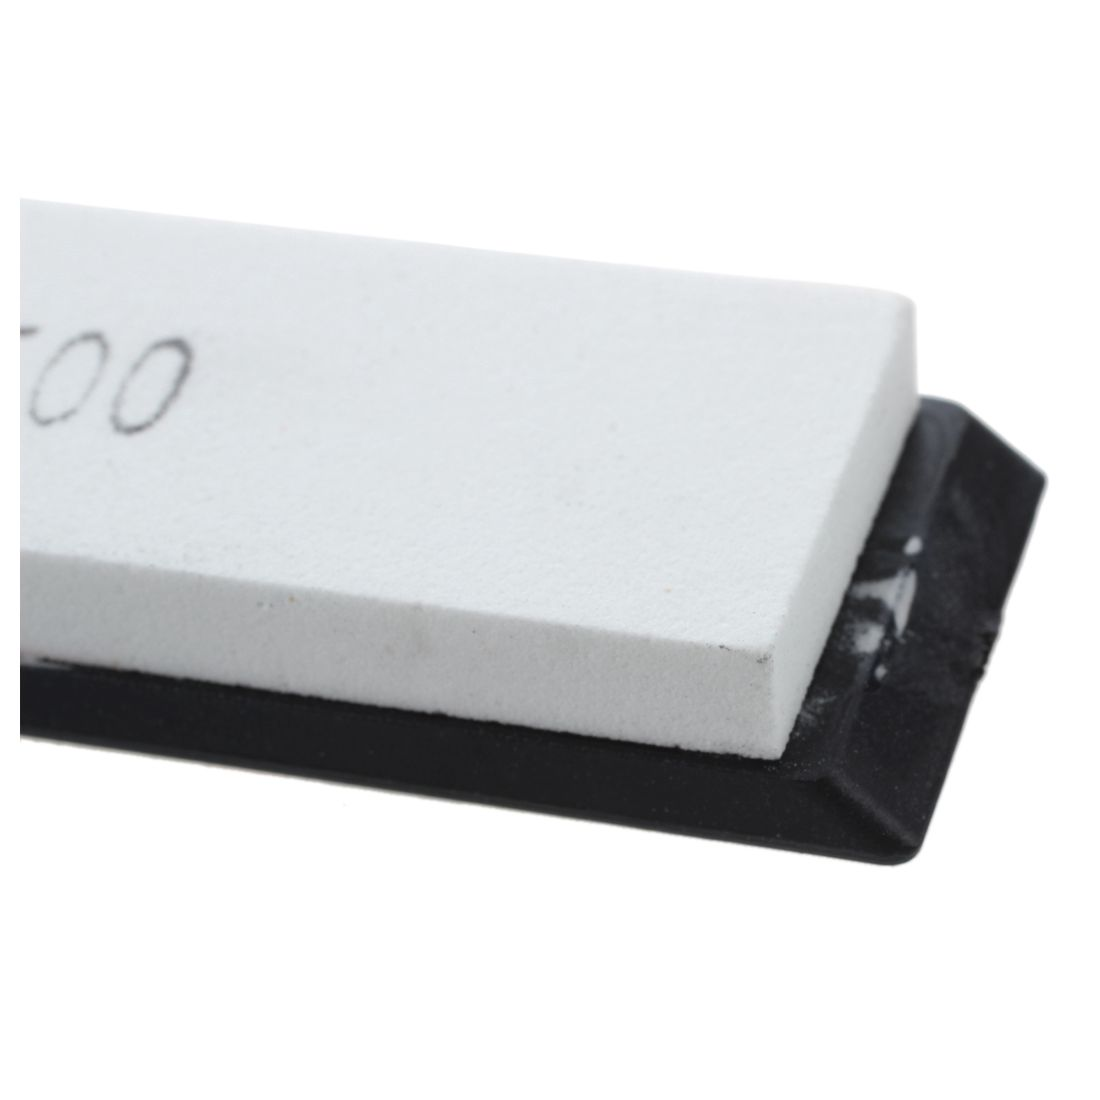 wholesale-price-ADAEE-pierre-a-aiguiser-Couteau-a-pierre-a-aiguiser-Fusil-E2J8